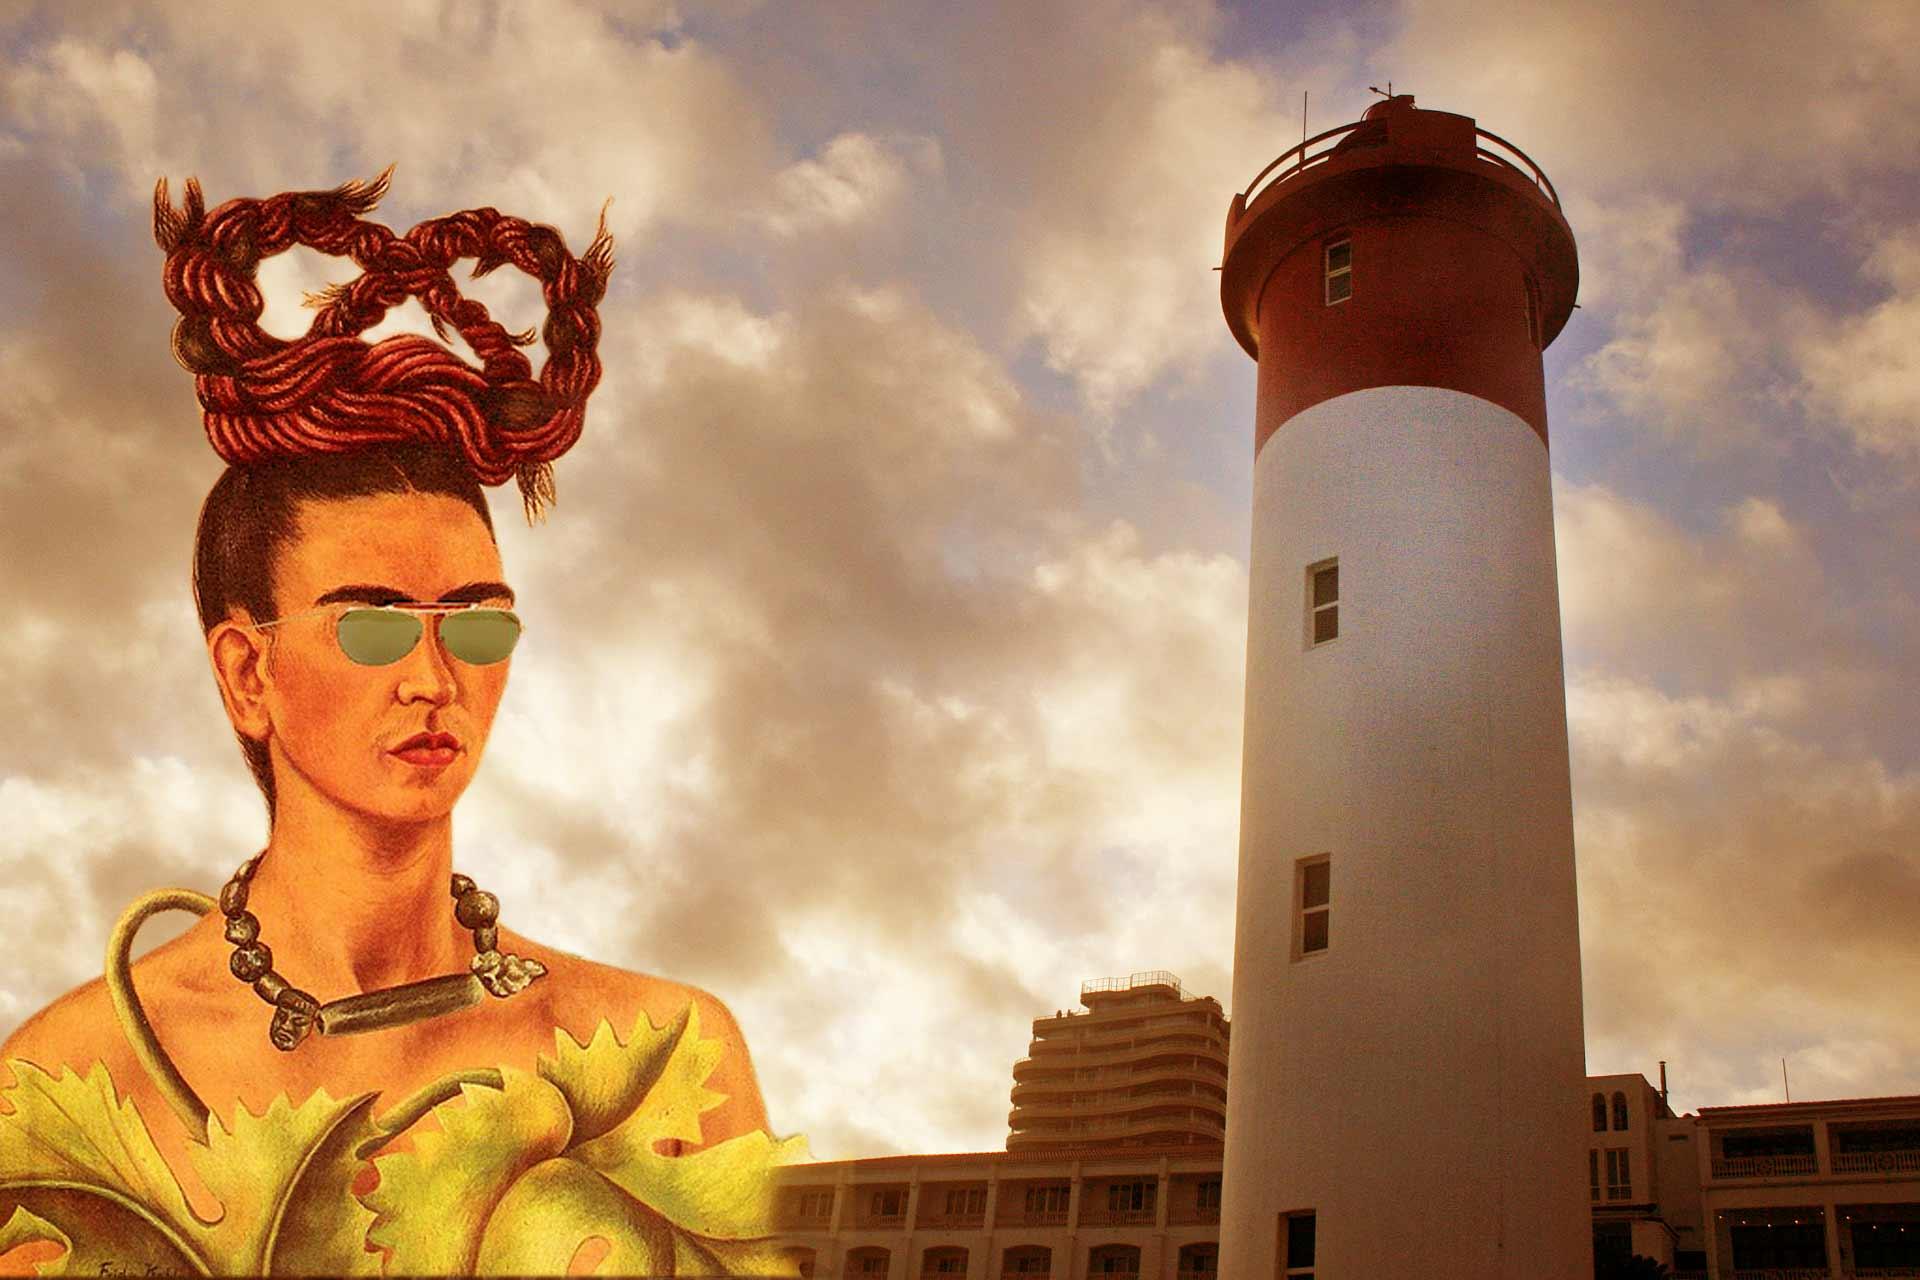 Frida Kahlo in an Umhlanga flavoured photomontage/